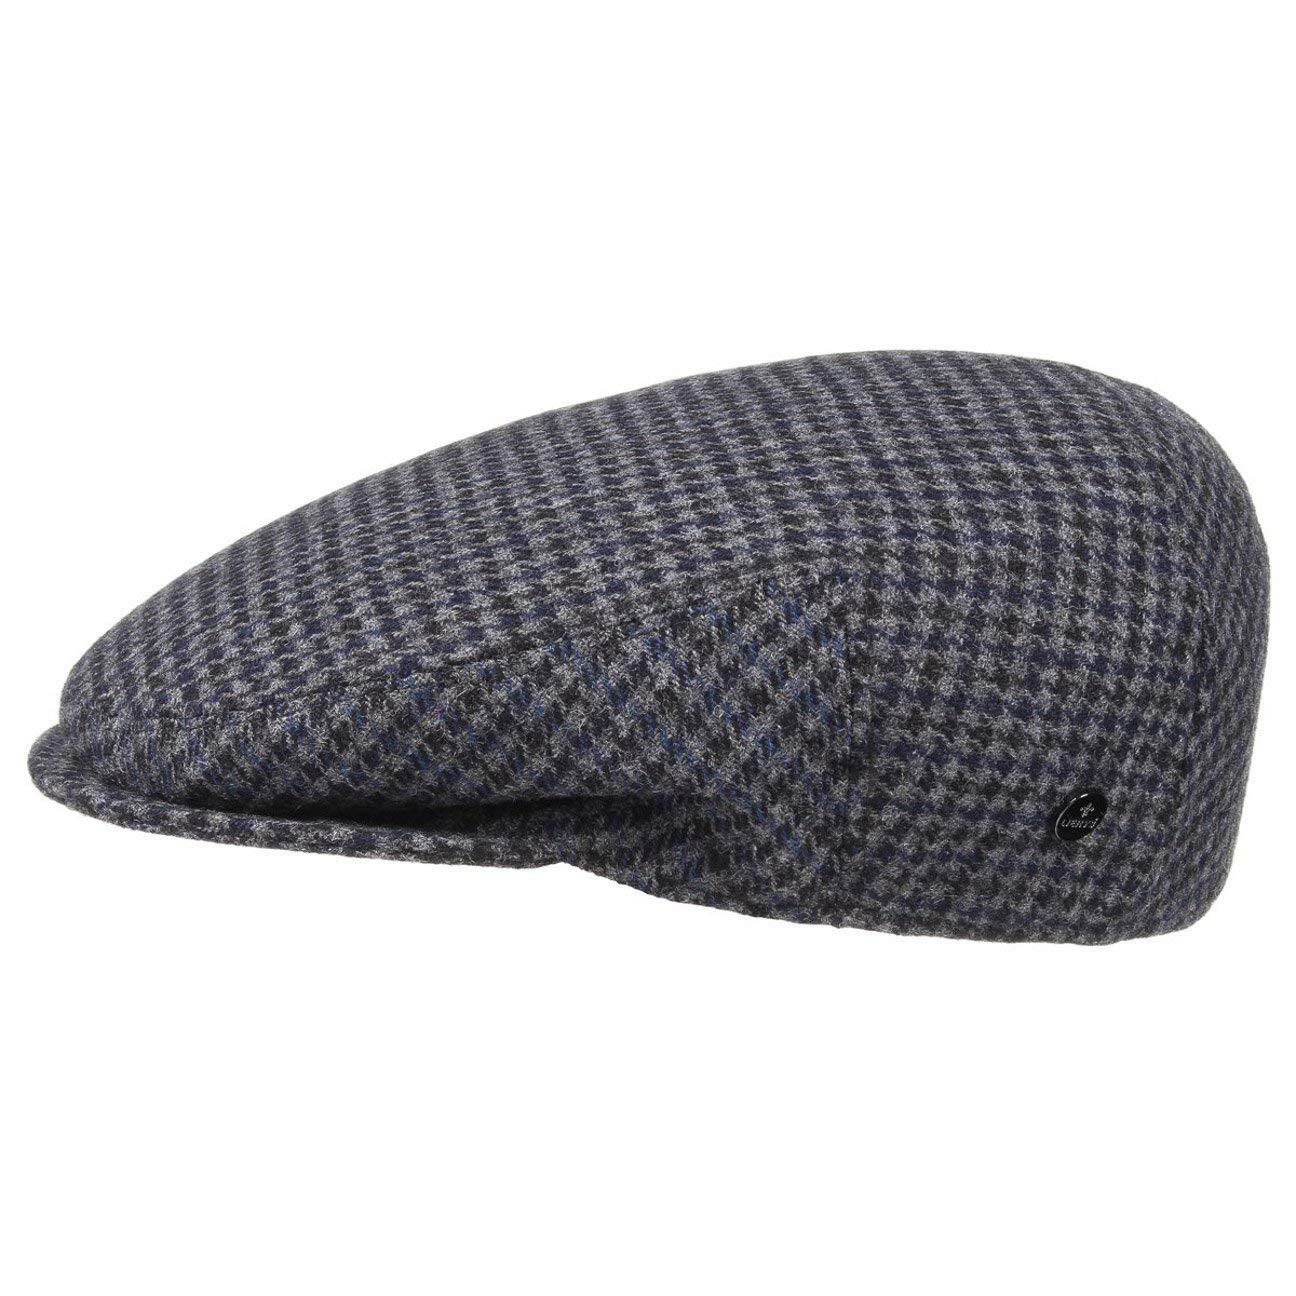 Lierys Britain Pied de Poule Coppola by Uomo Fodera Estate//Inverno Made in Italy Flat cap Cappello Piatto Invernale con Visiera